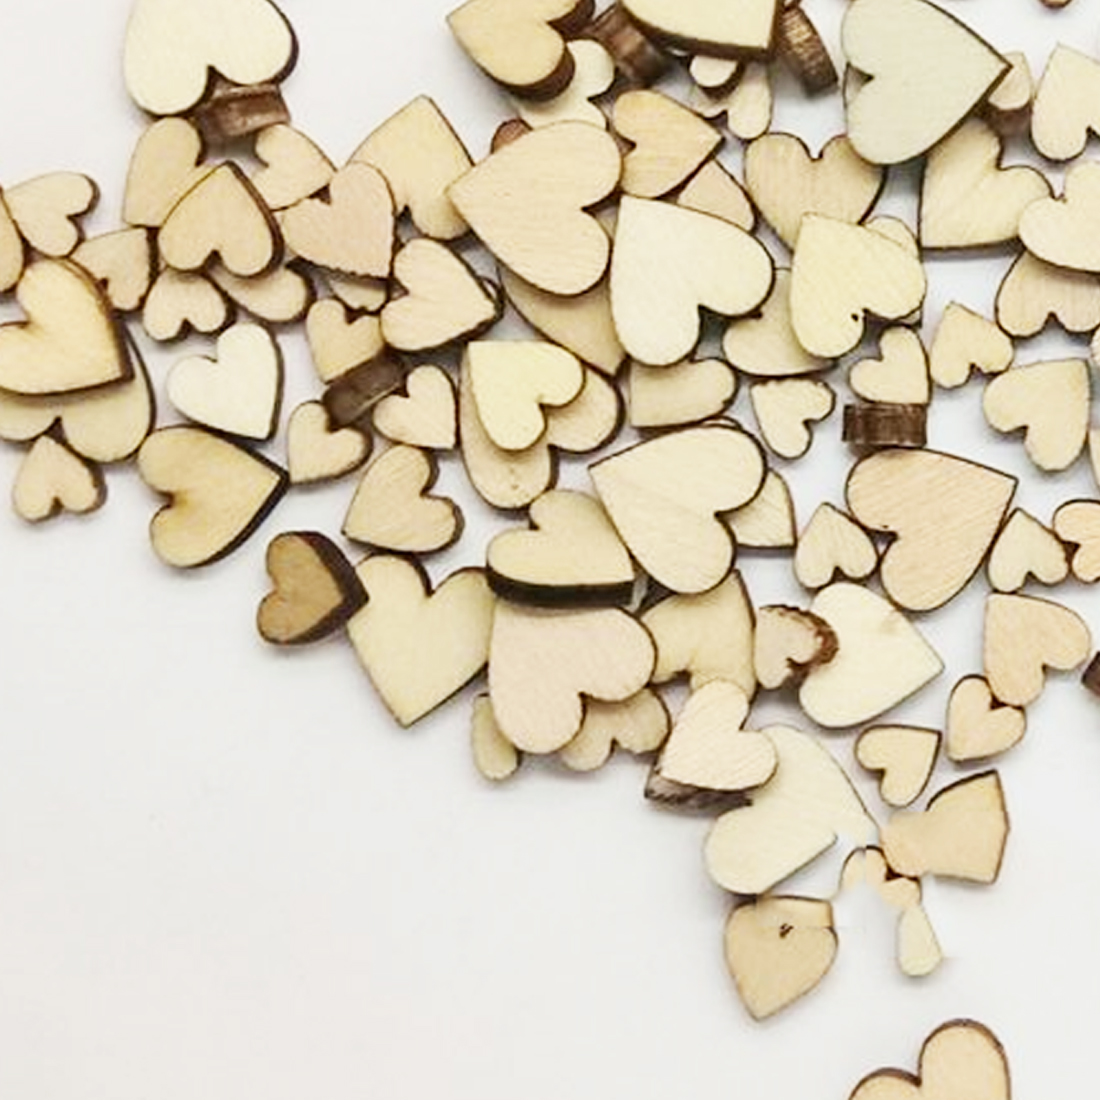 50-200pcs Wooden Heart Kids Birthday Party Diy Scrapbook Craft Wedding Gift